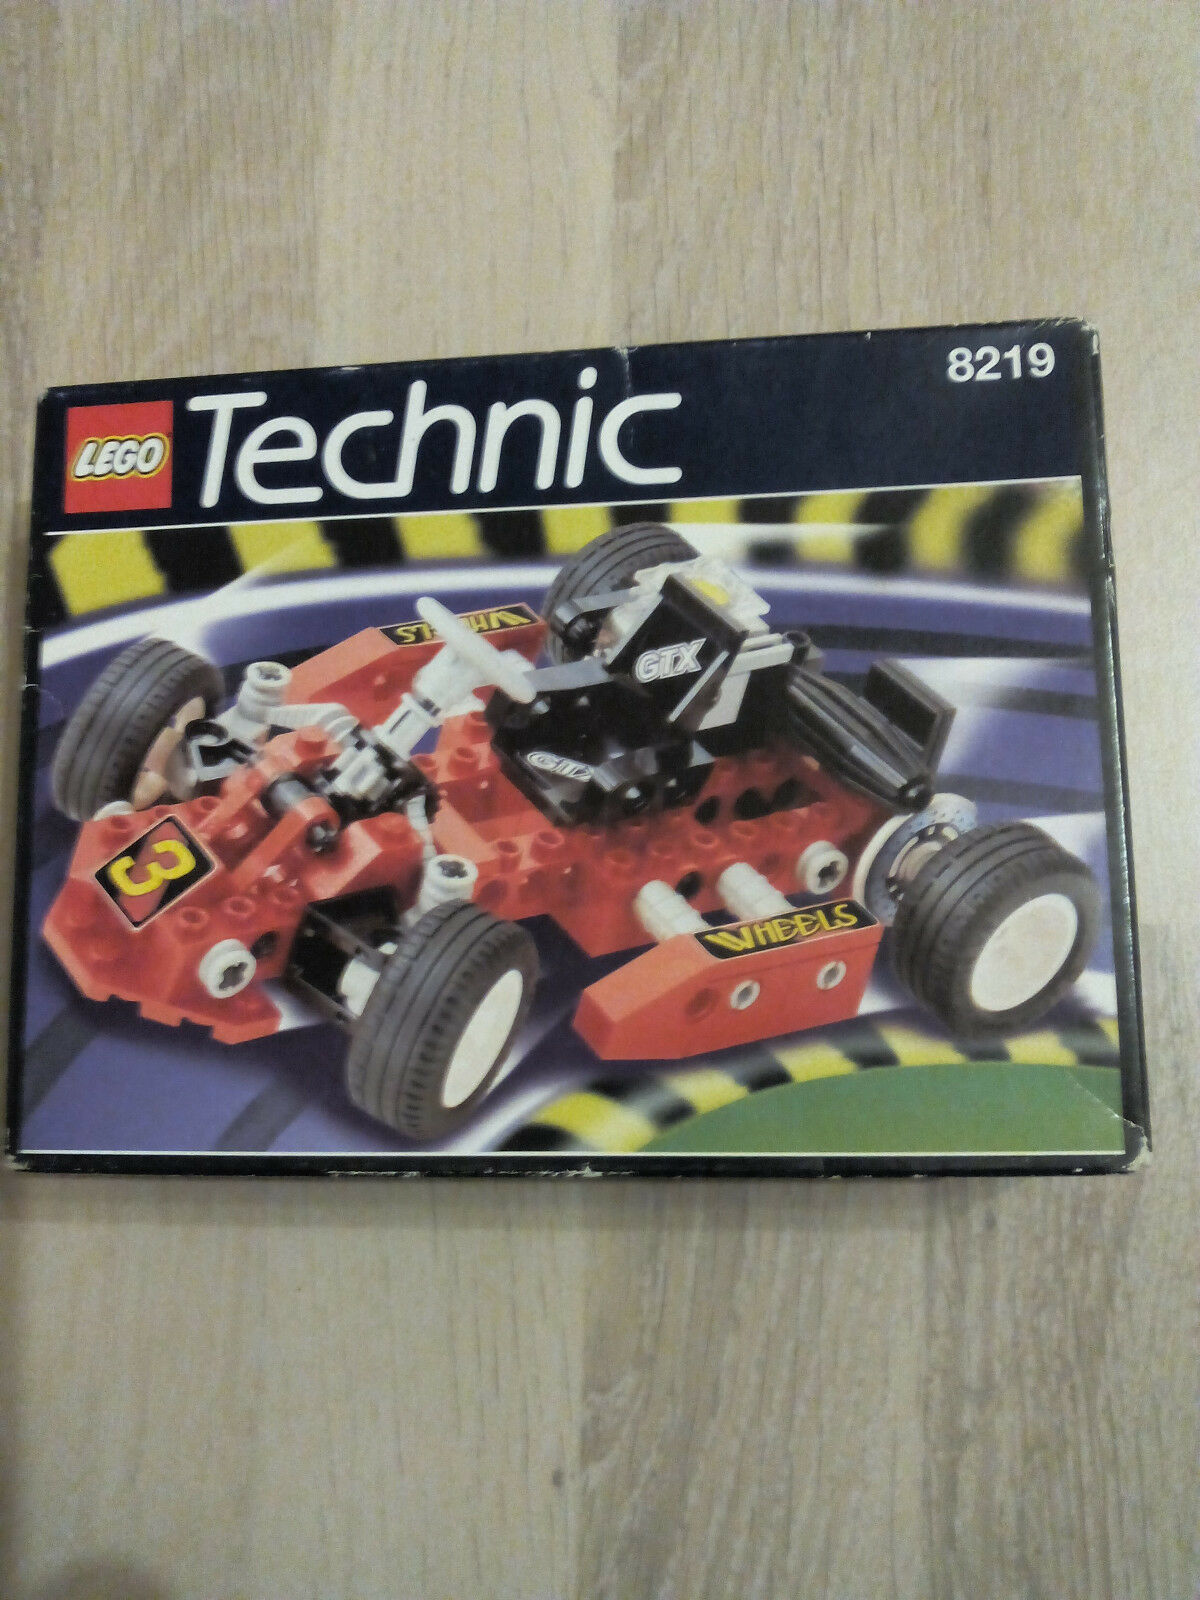 Lego Technic Technik 8219 Race Kart   NEU & OVP - UNGEÖFFNET